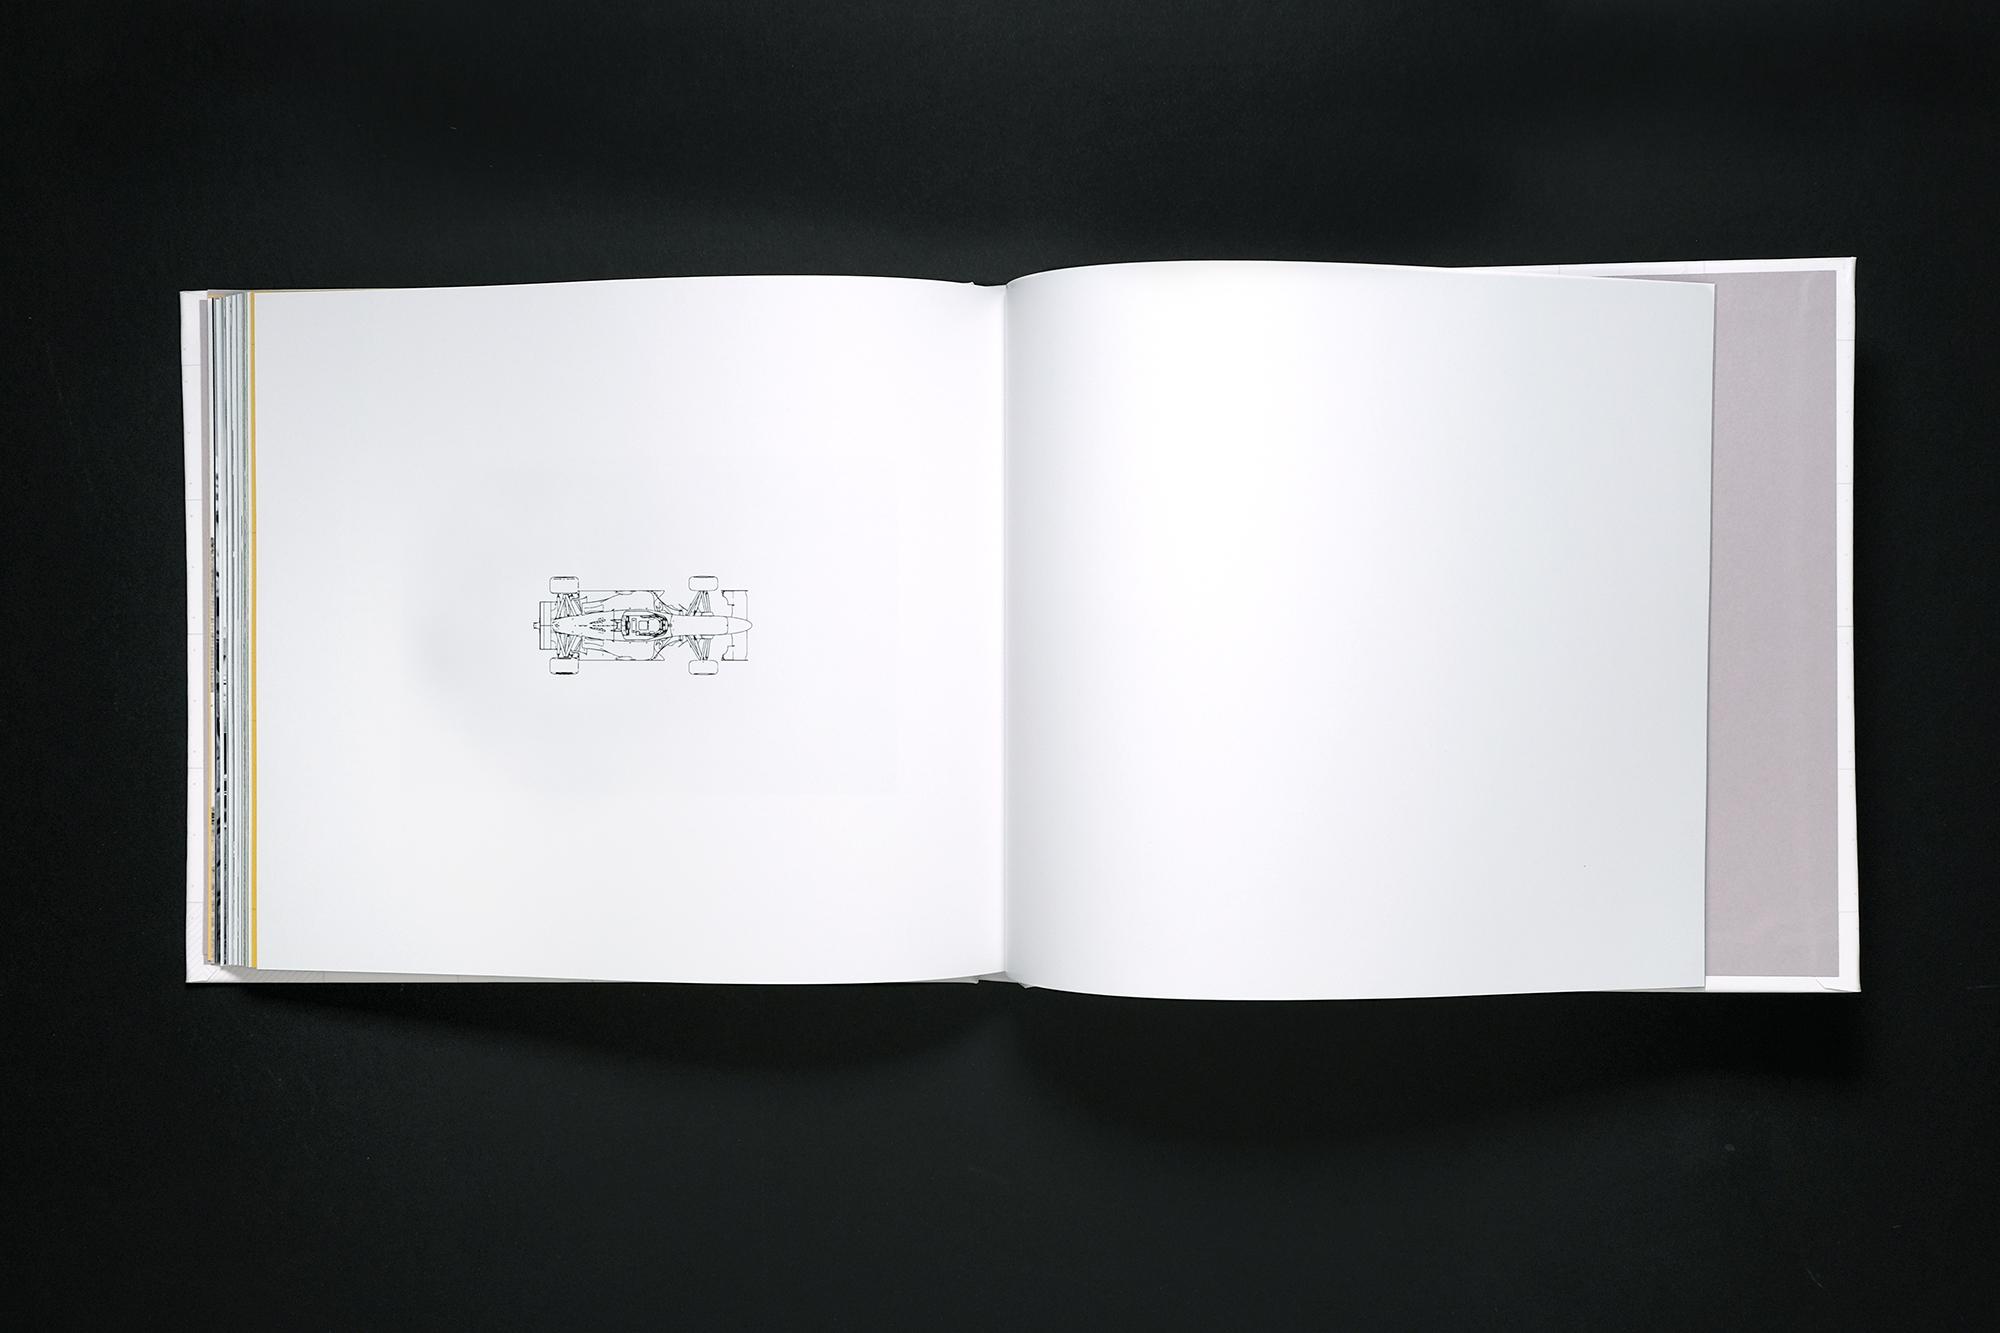 https://rusyndesign.co.uk/wp-content/uploads/2020/04/UWR-19-book-shots-27.jpg